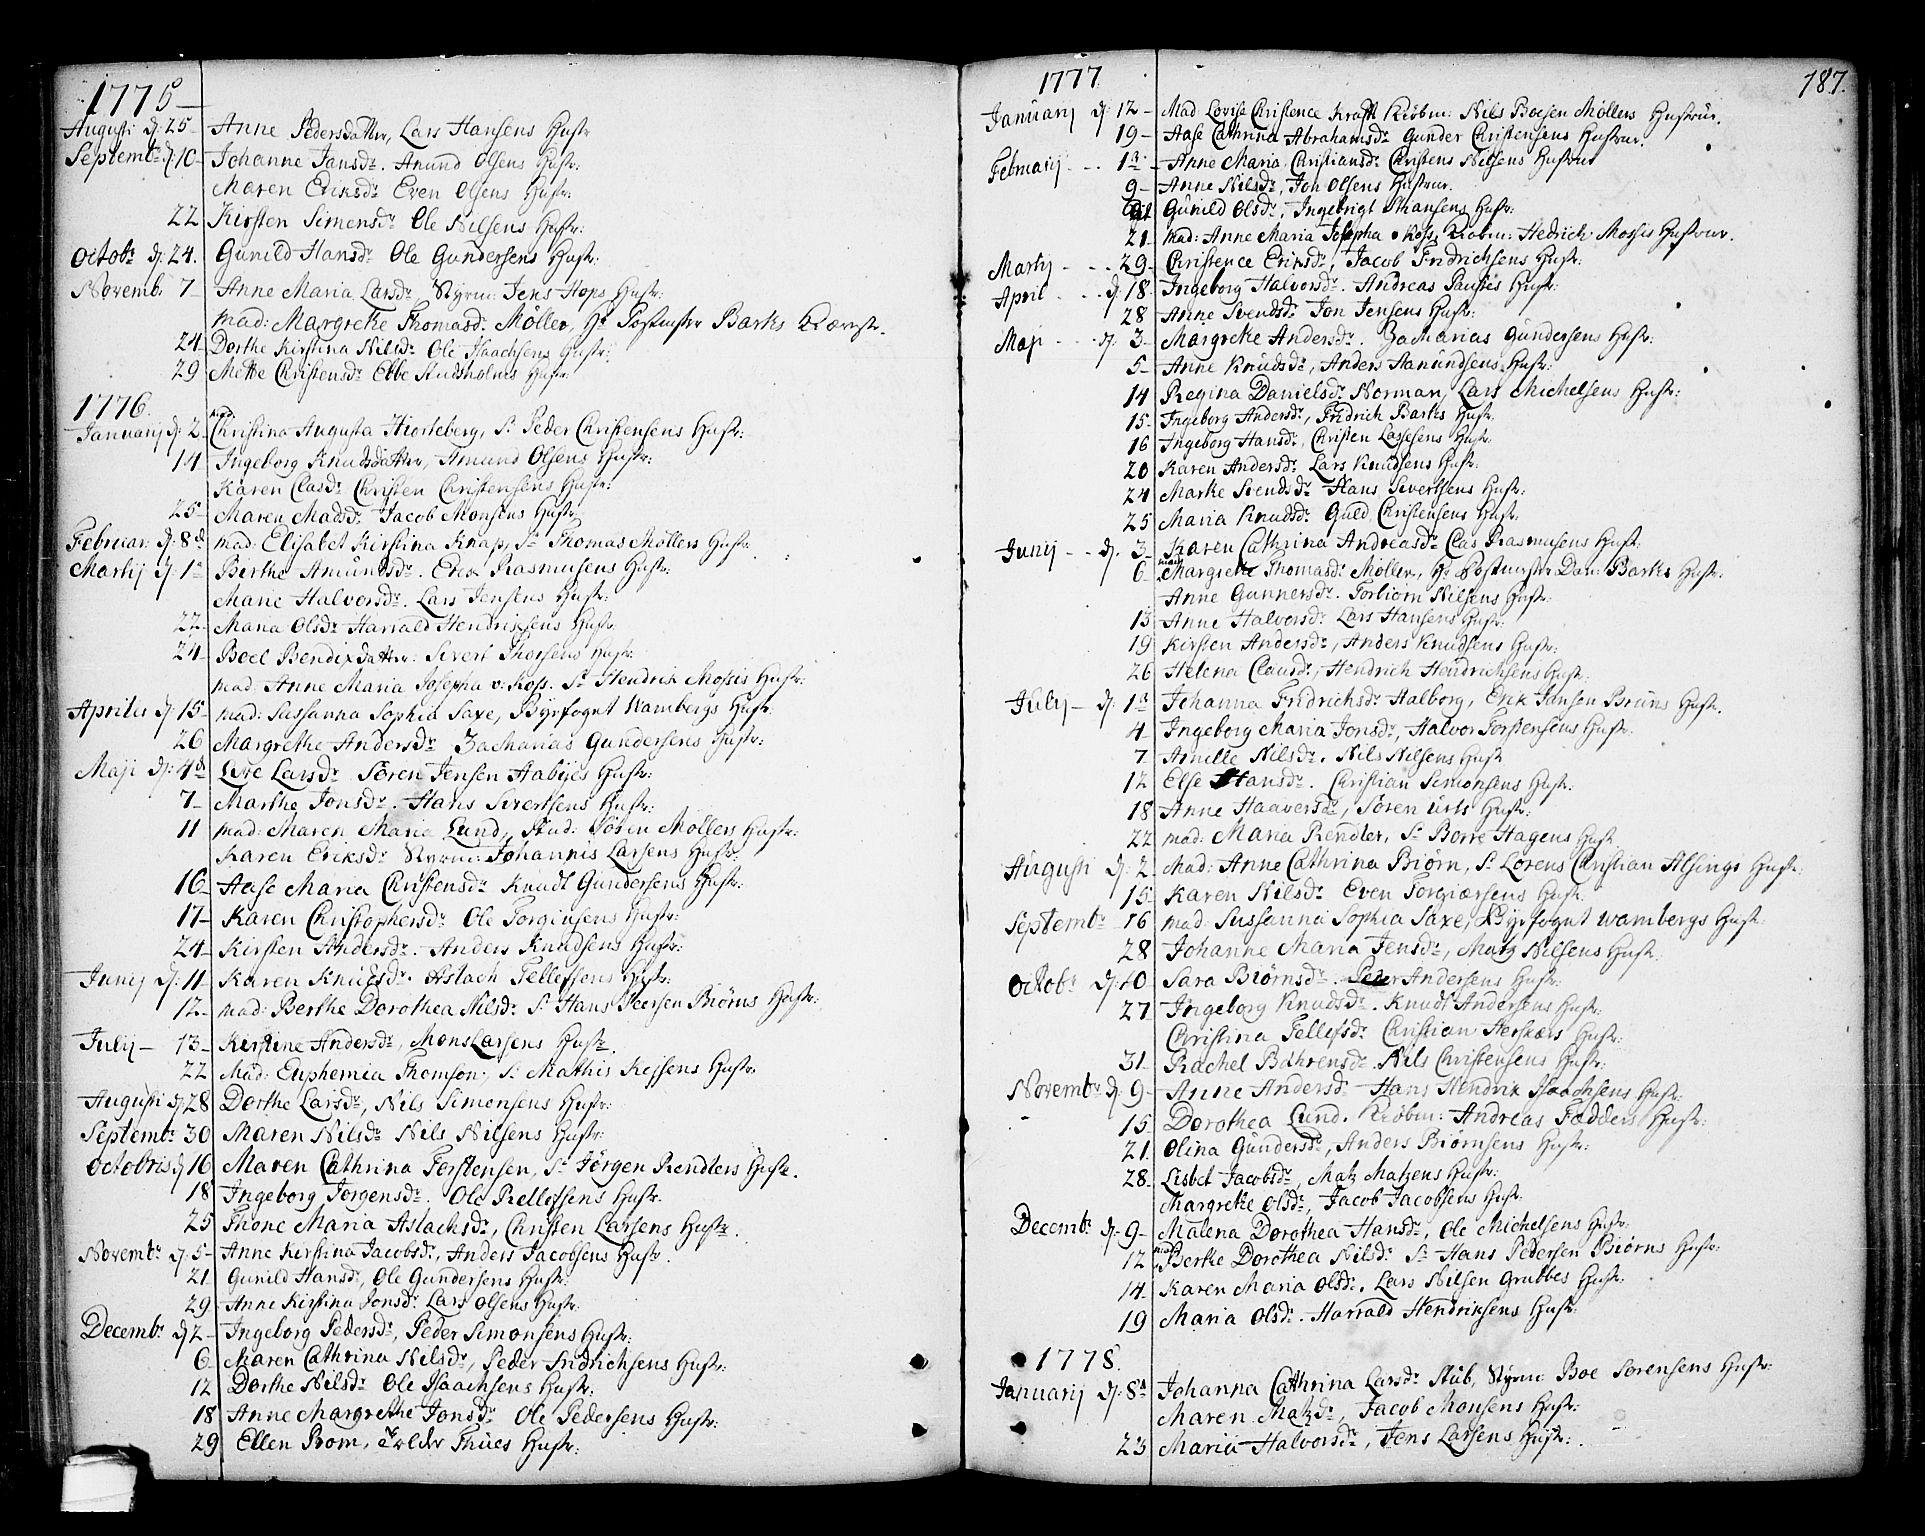 SAKO, Kragerø kirkebøker, F/Fa/L0002: Ministerialbok nr. 2, 1767-1802, s. 187